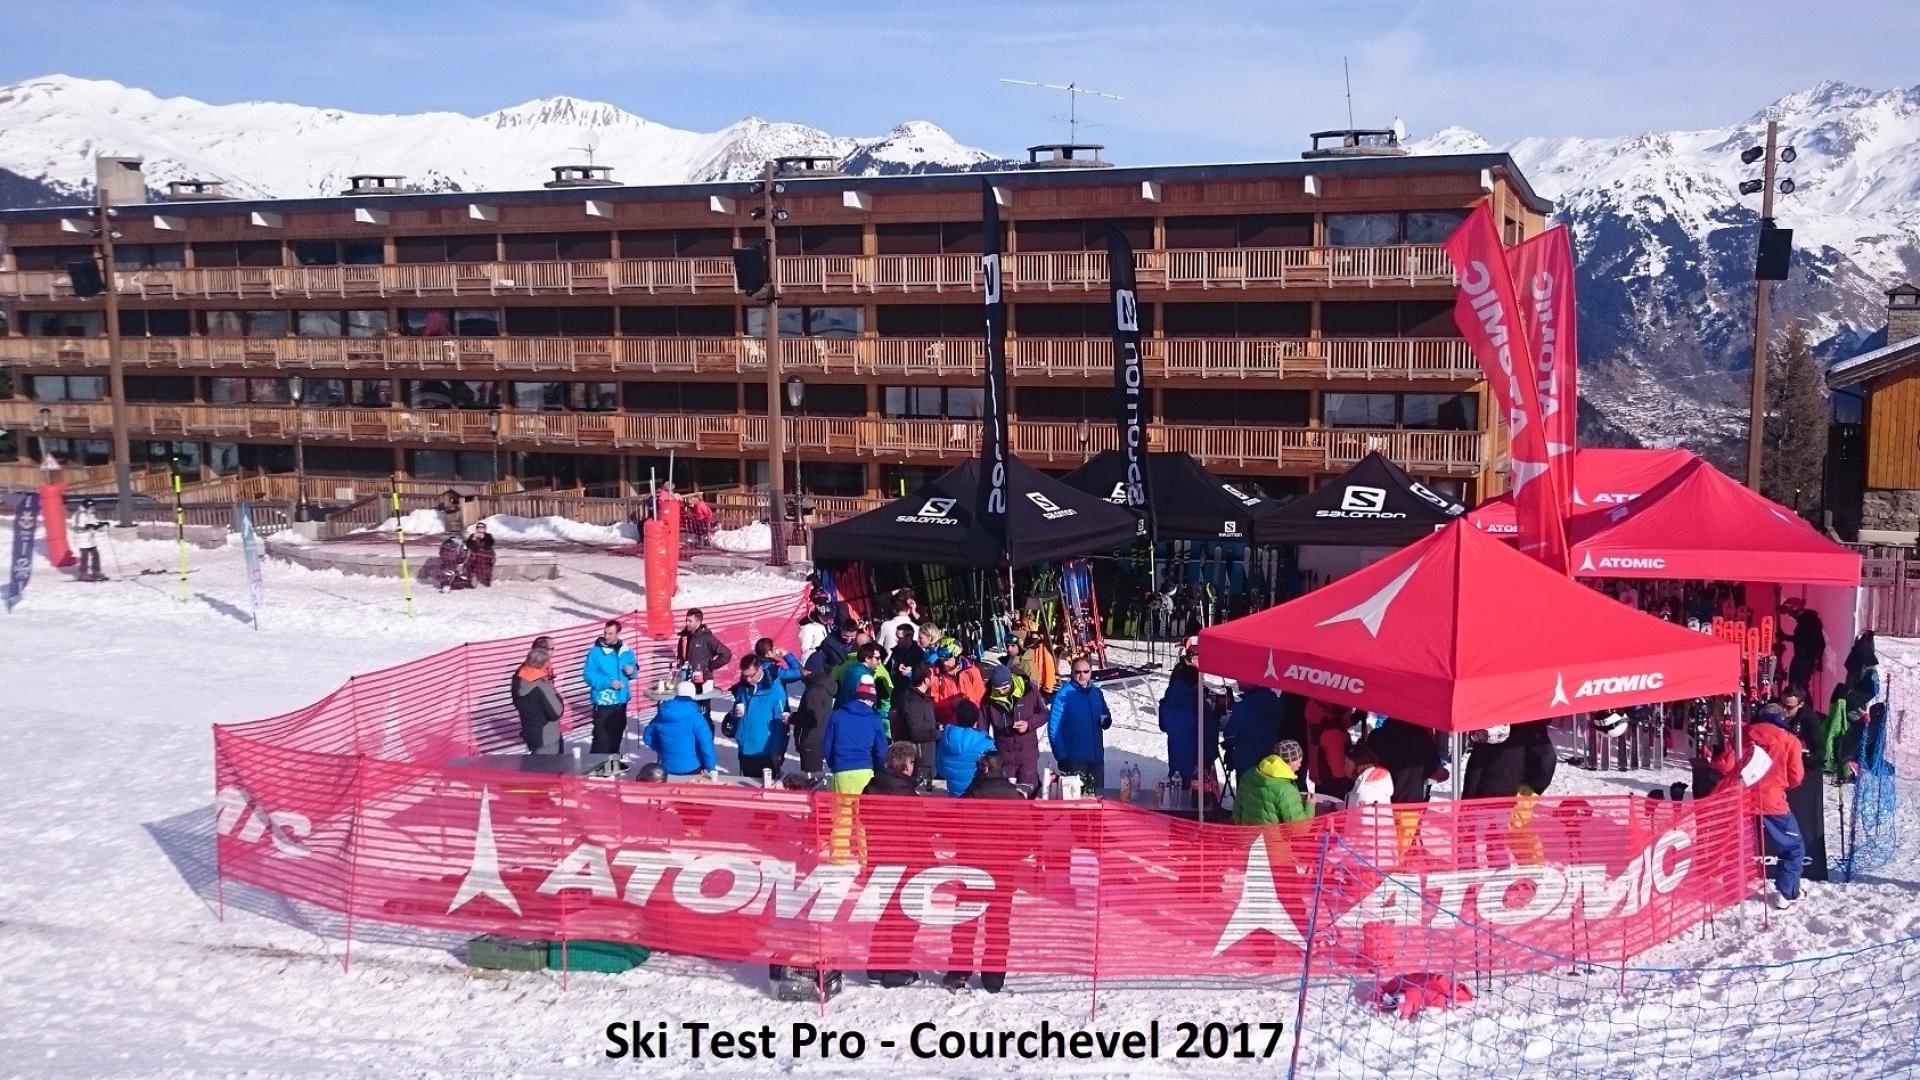 Ski test Pro – Courchevel 2017